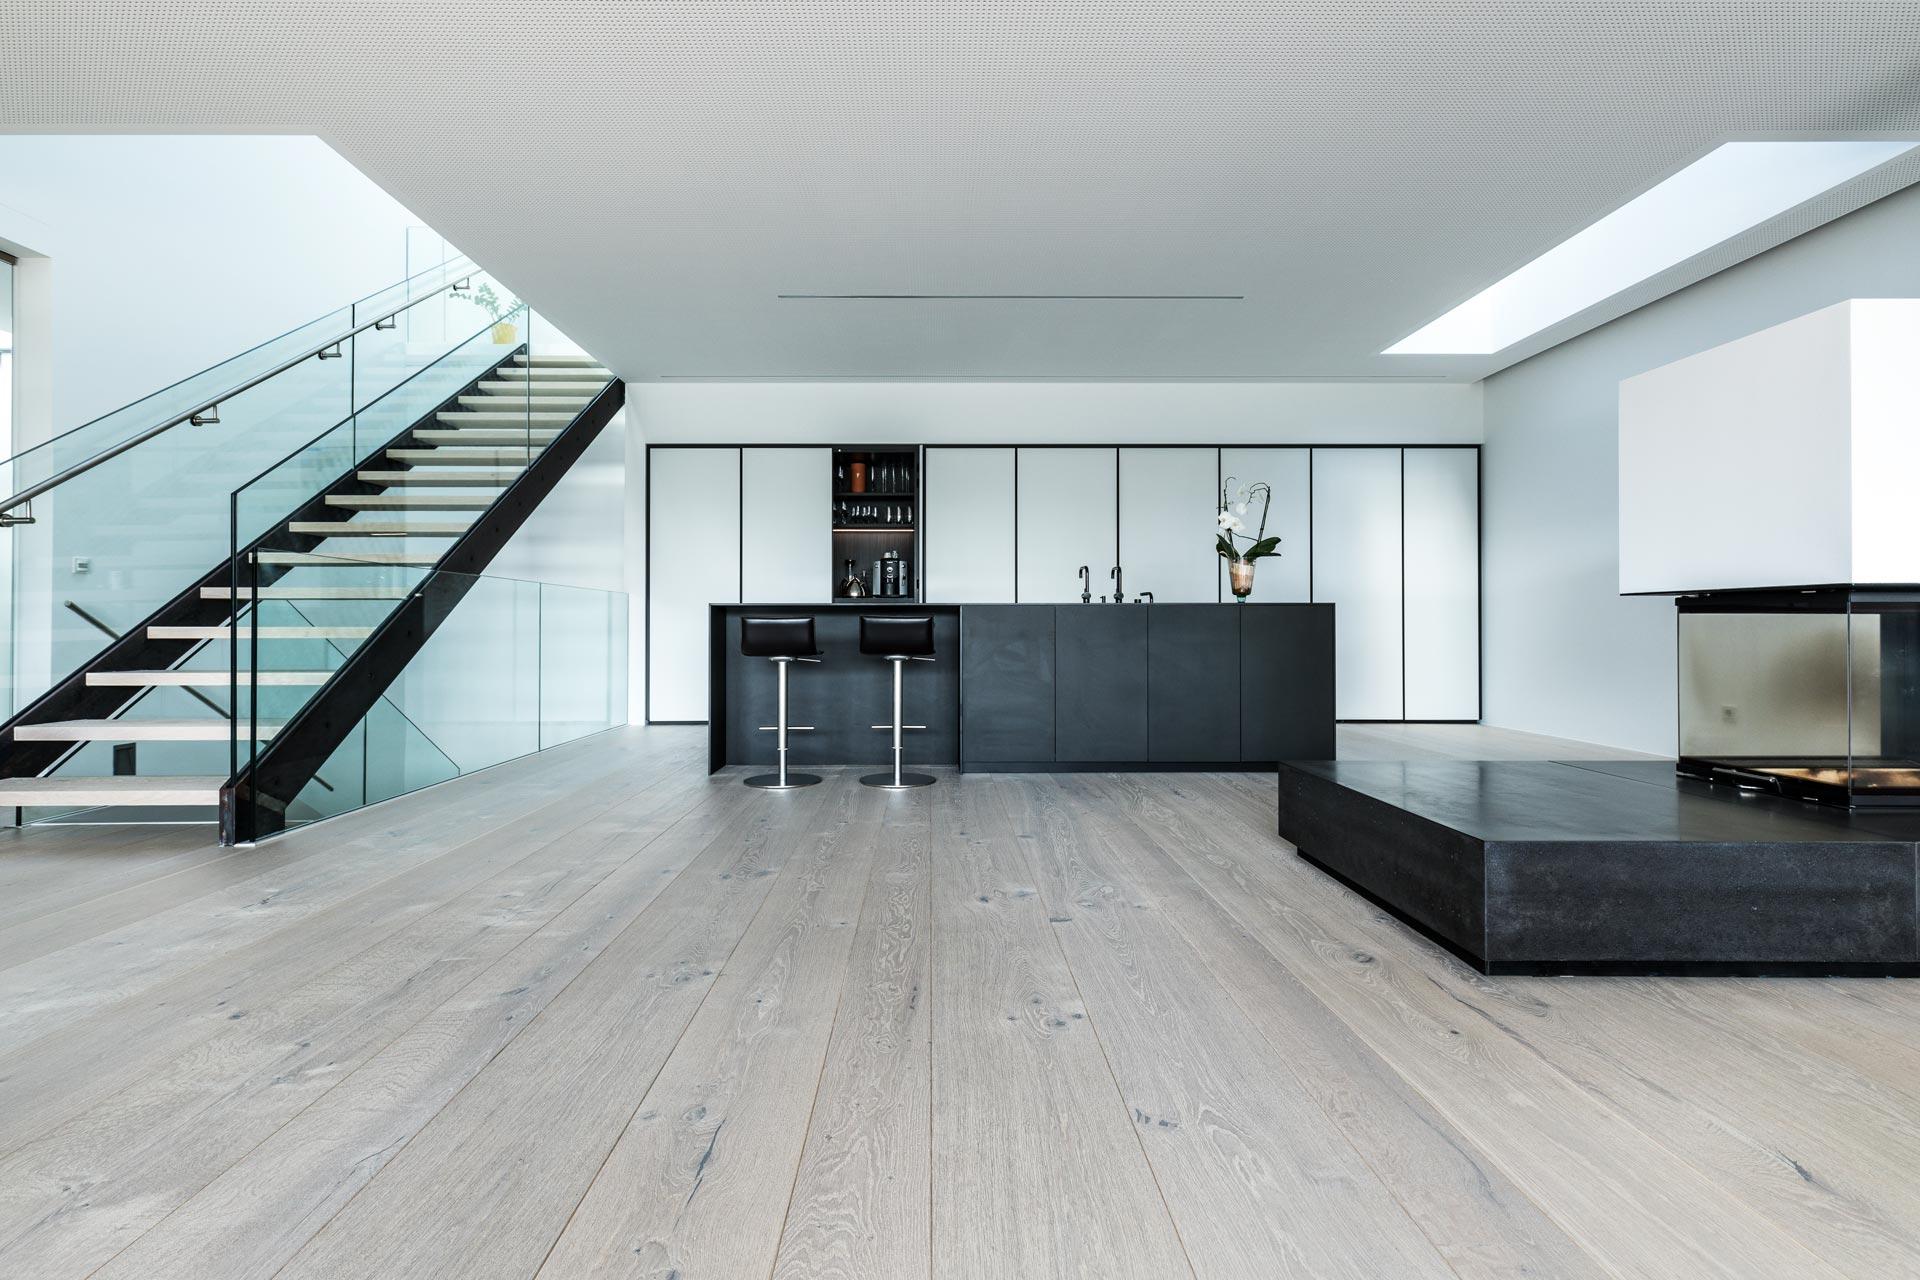 fenster t ren b den qualit tsprodukte josko immobilien. Black Bedroom Furniture Sets. Home Design Ideas